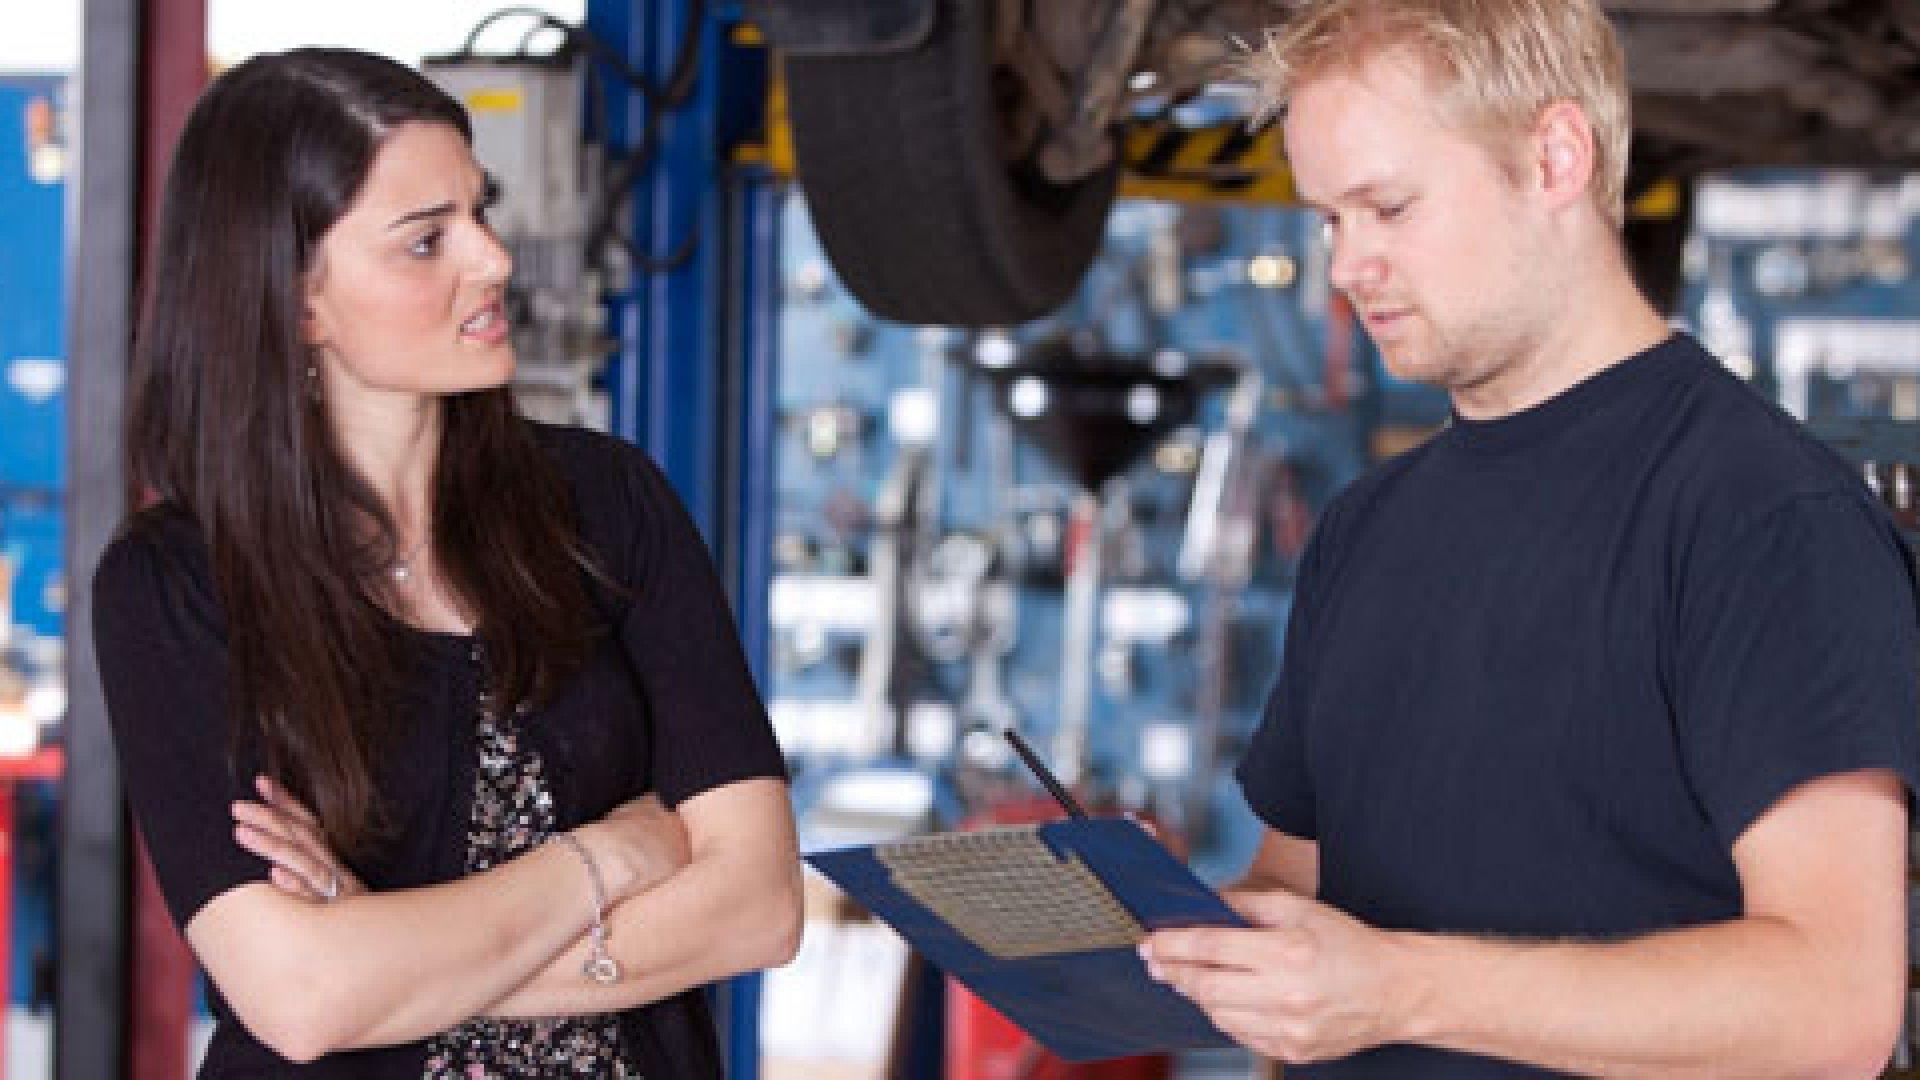 5 Steps to Handling a Customer Complaint